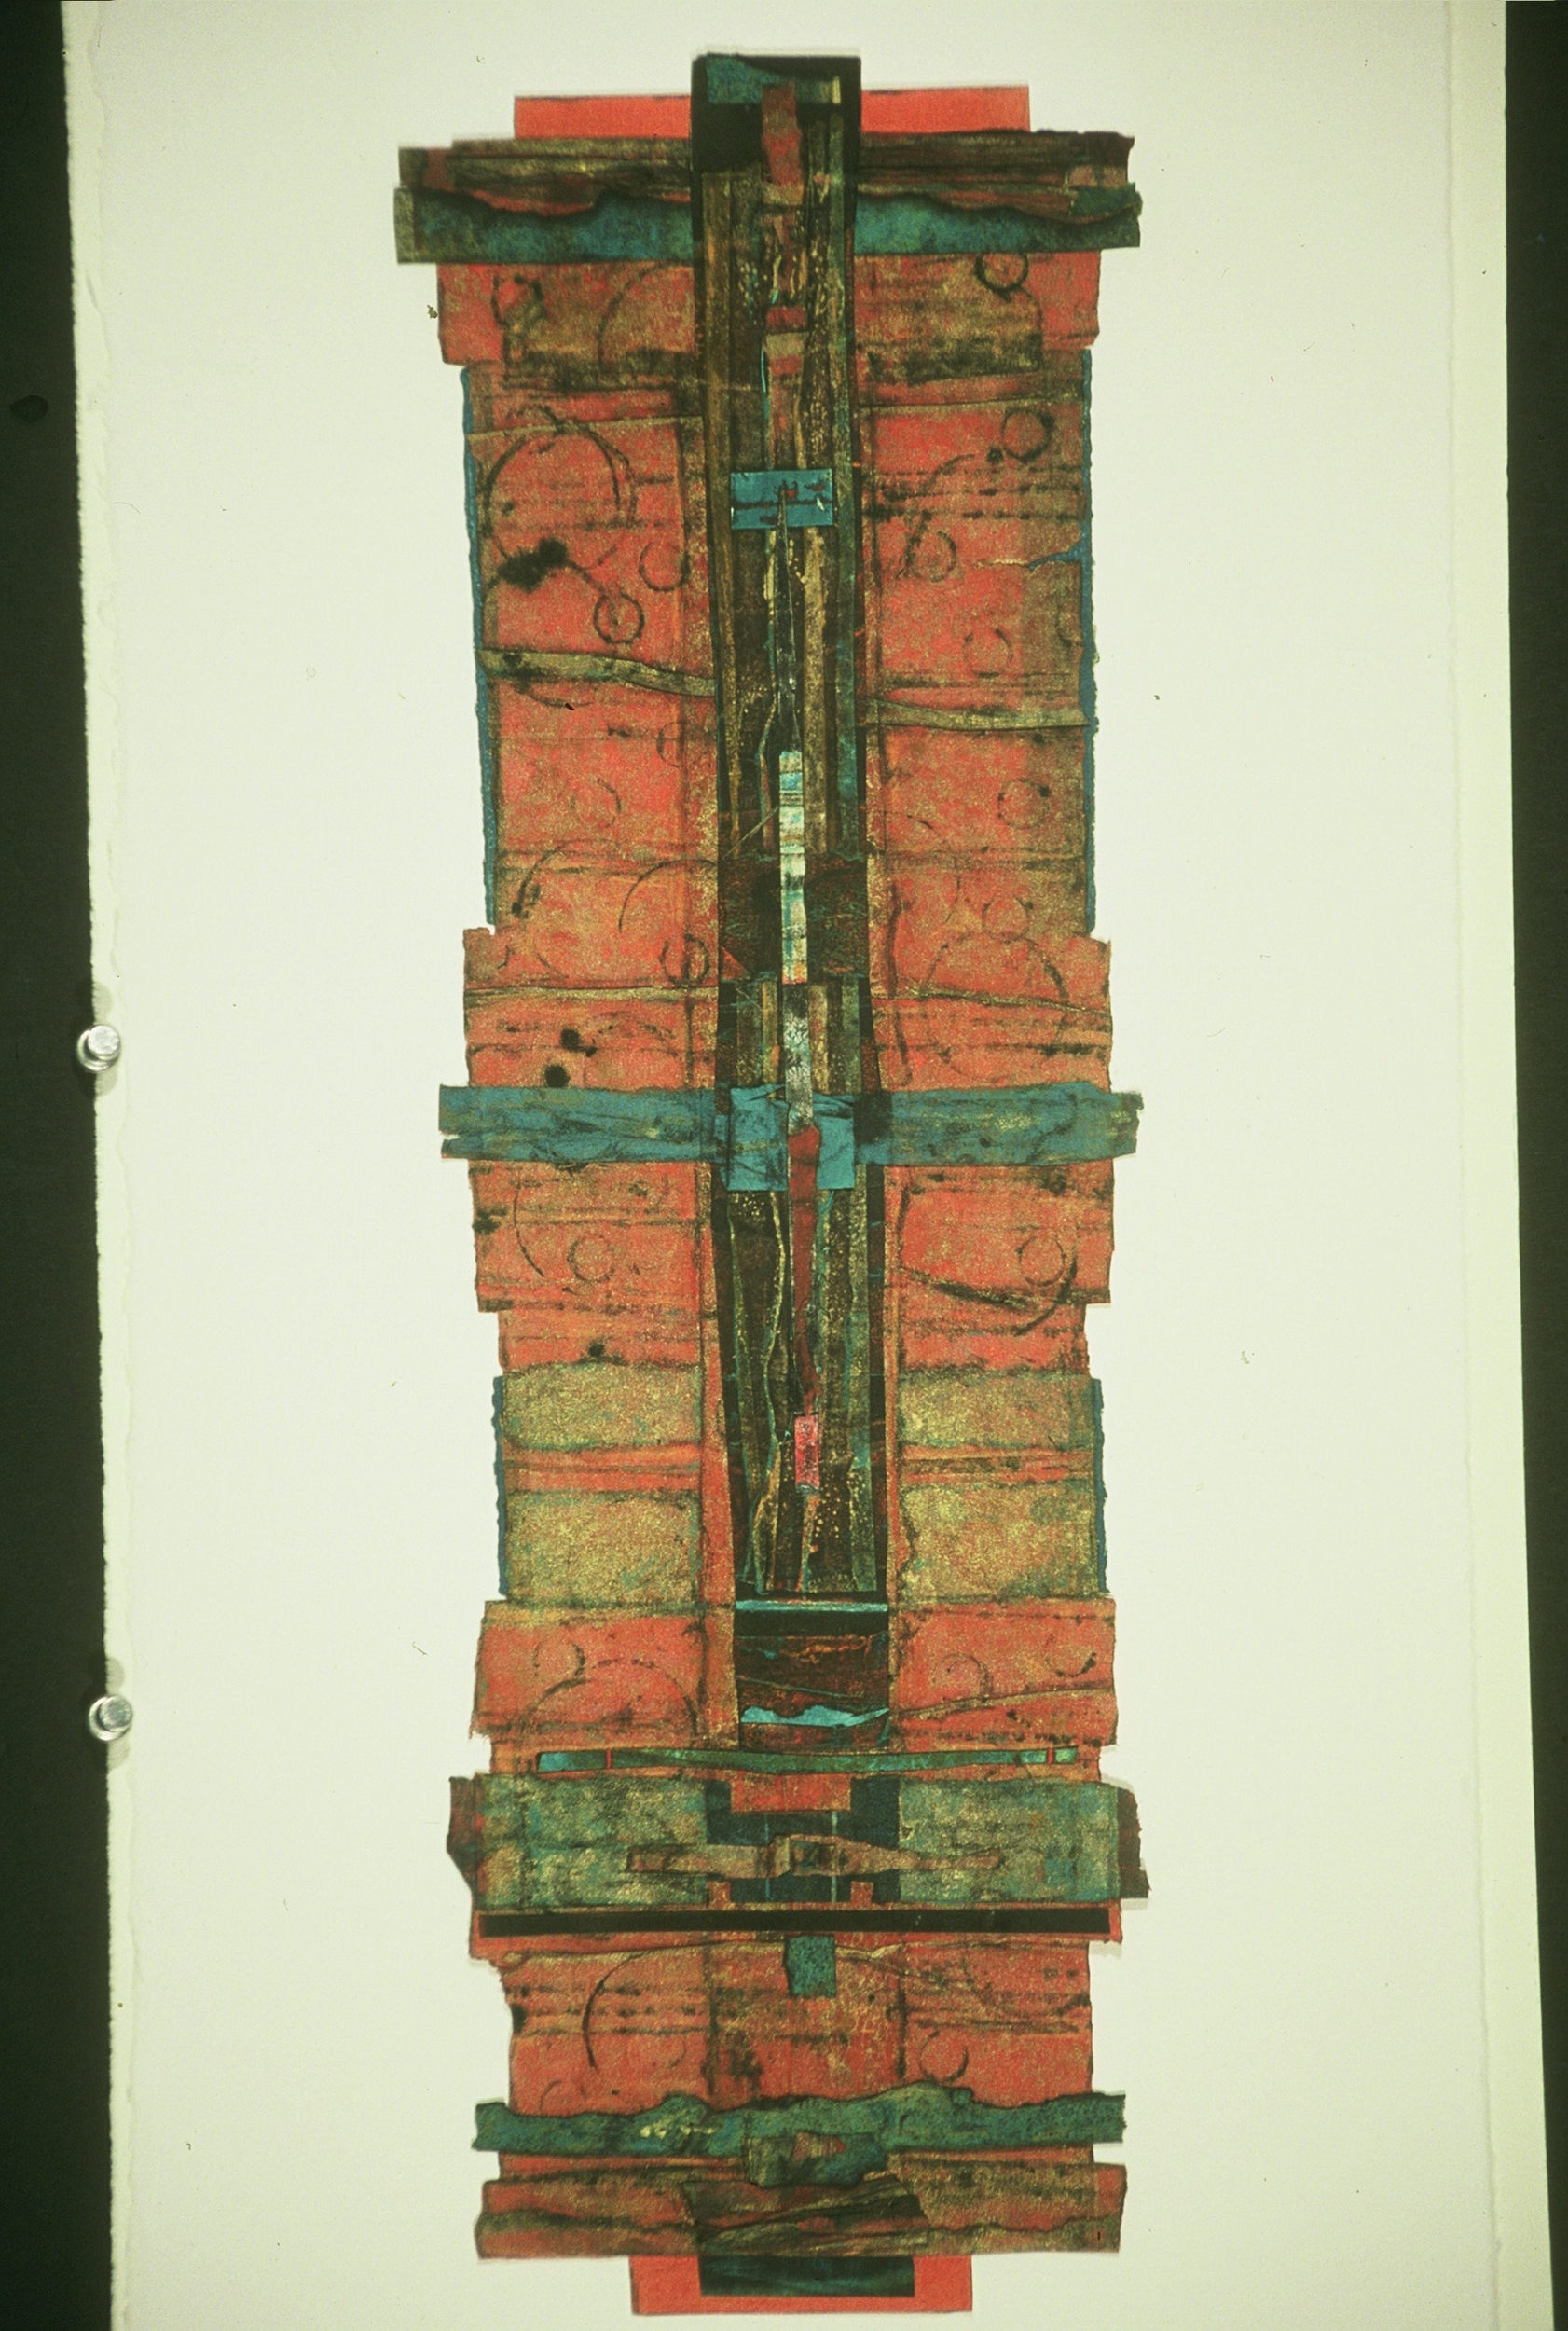 Tsung Column-Shang Dynasty